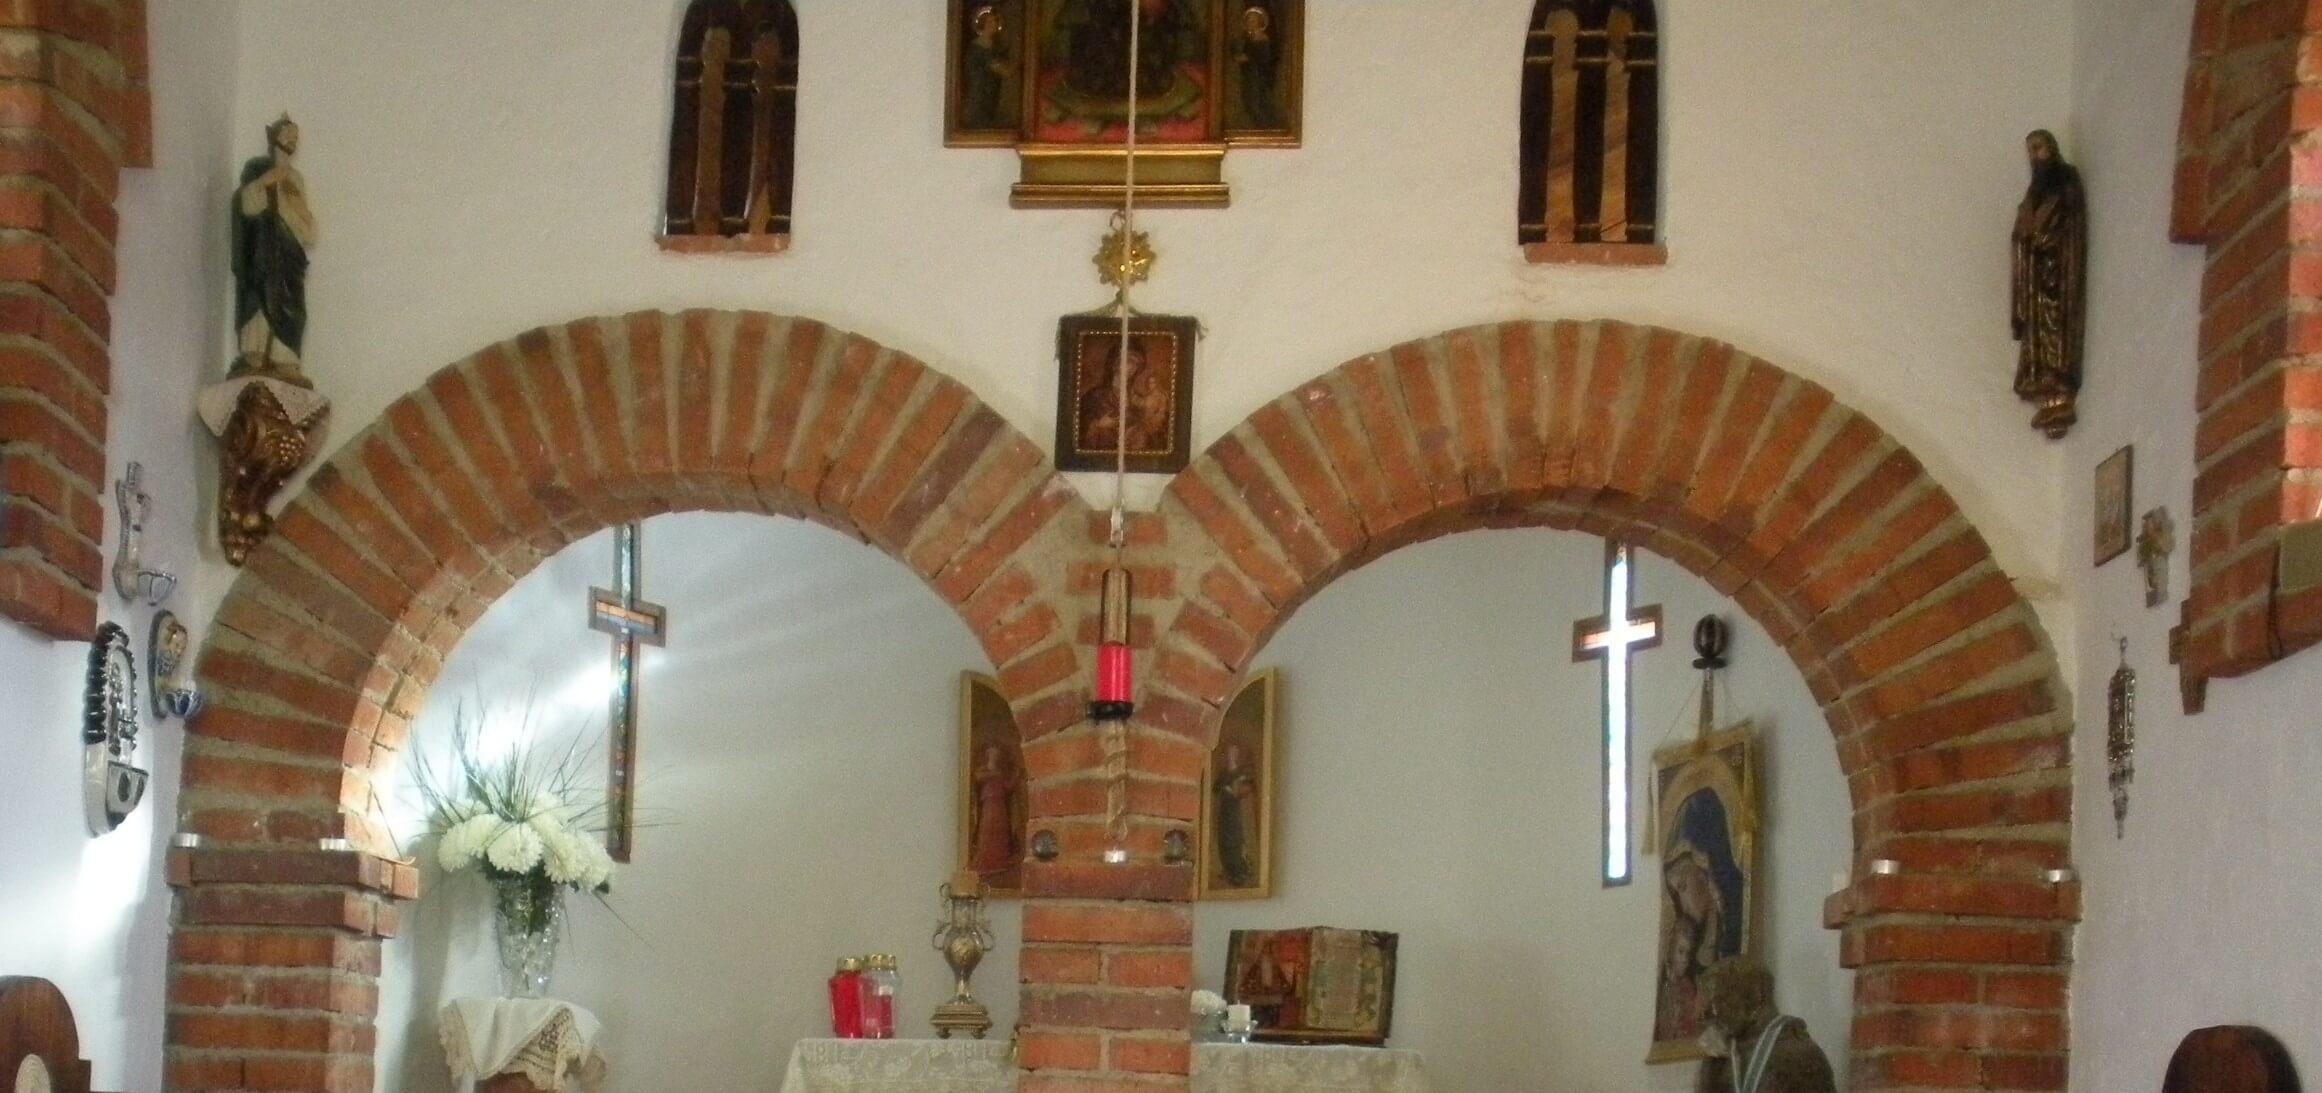 capilla 6